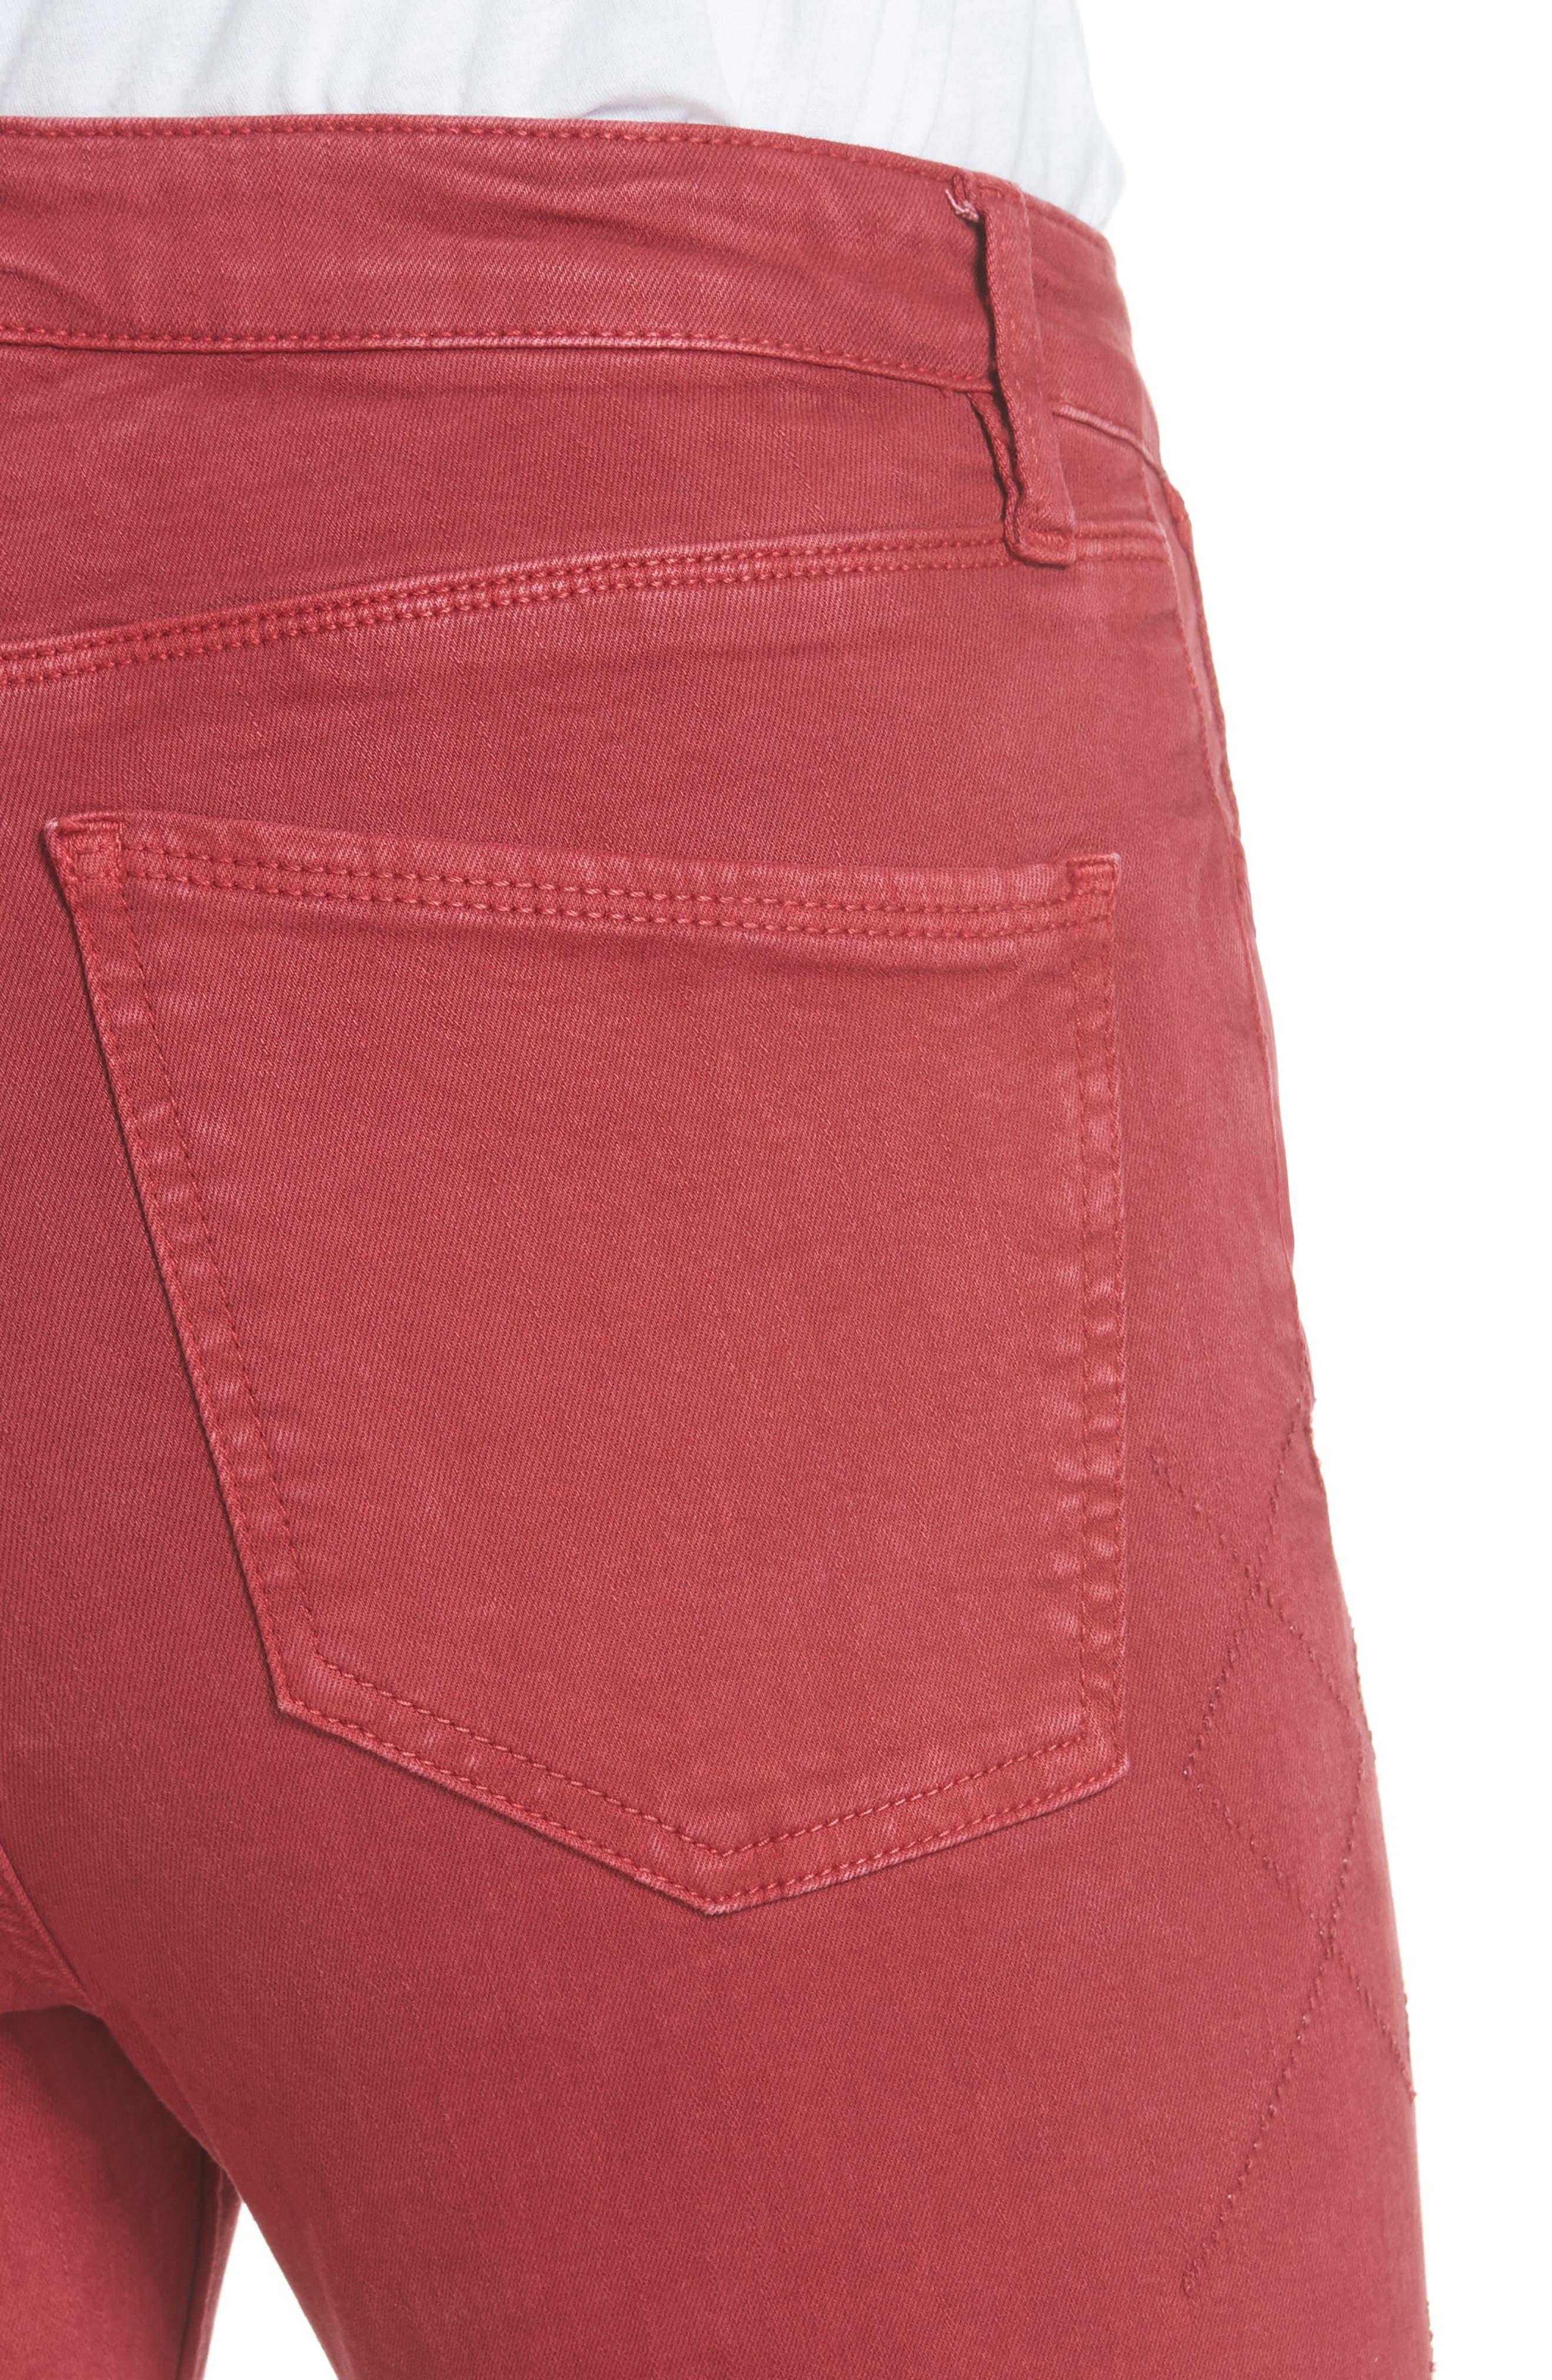 Rolling Old Reina Lattice Stitch Skinny Jeans,                             Alternate thumbnail 4, color,                             FRAMBOISE